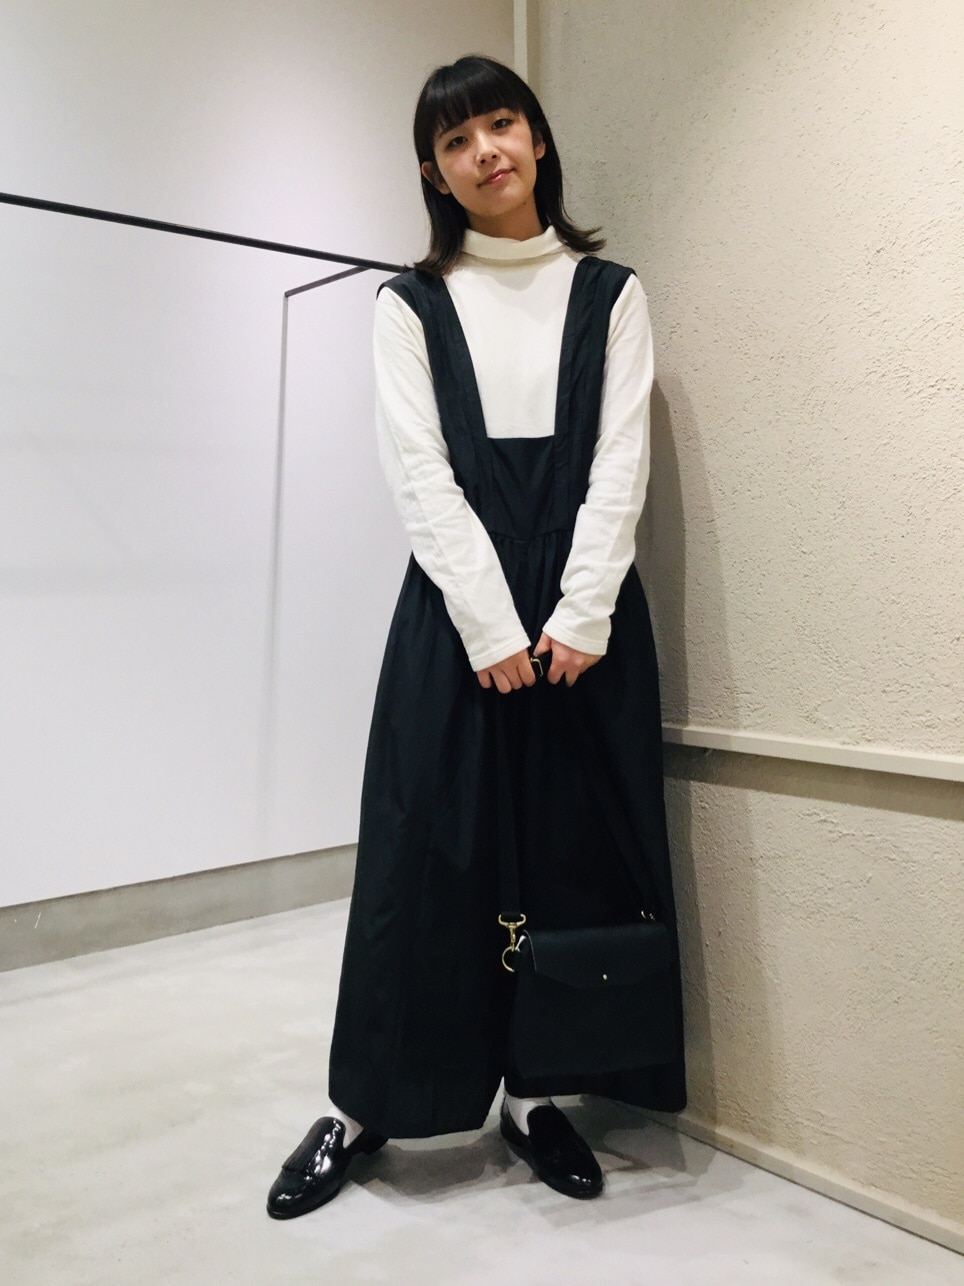 chambre de charme 横浜ジョイナス 身長:162cm 2020.09.23